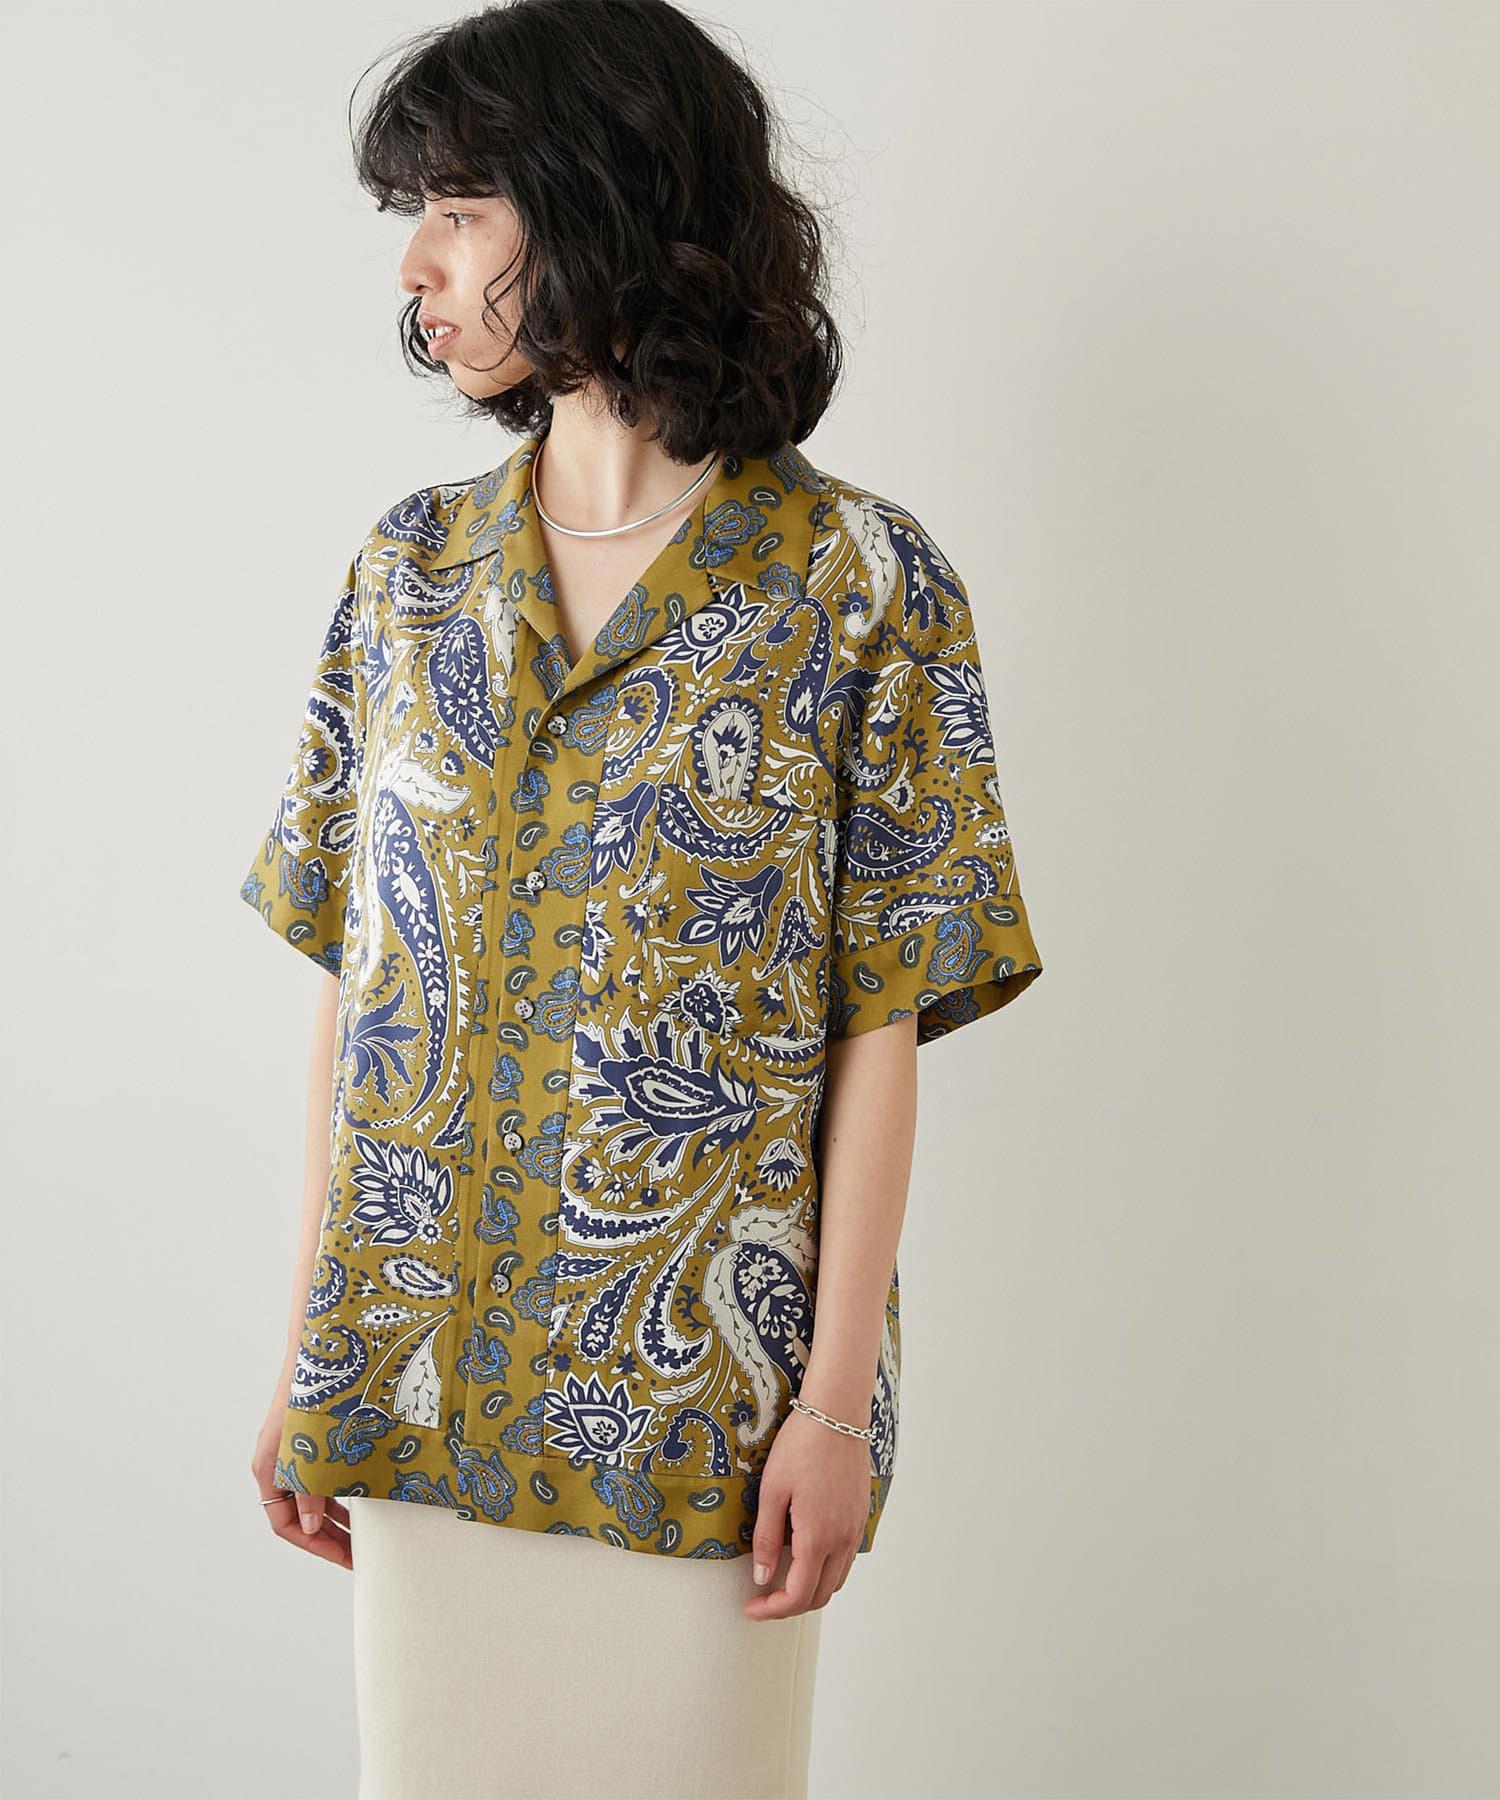 Whim Gazette(ウィム ガゼット) 【BANANATIME】シルクペイズリーシャツ